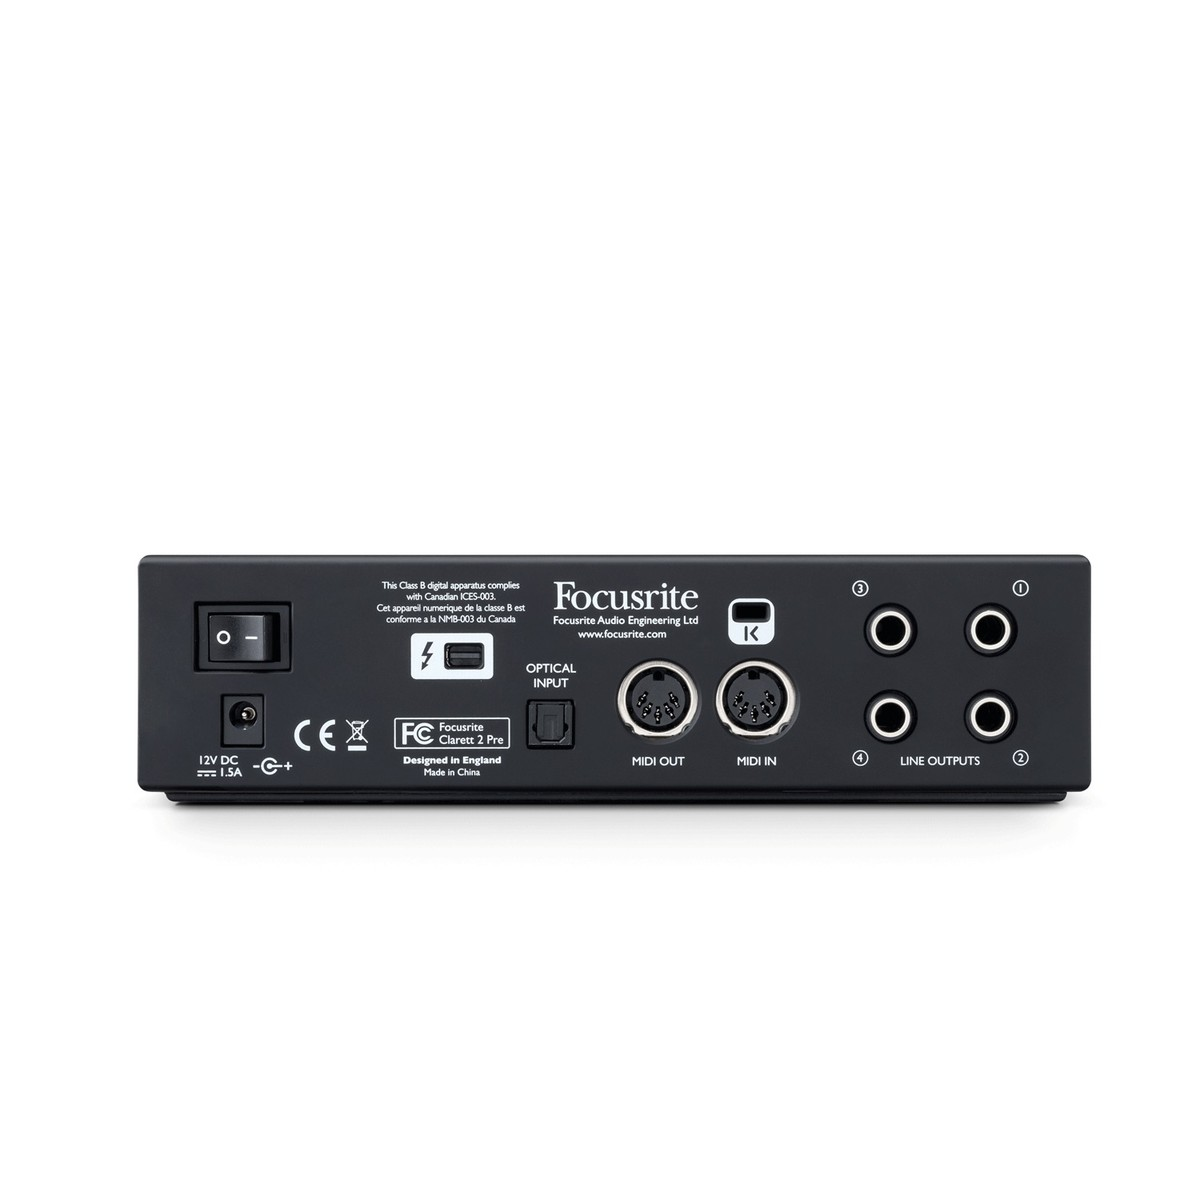 focusrite clarett 2 pre thunderbolt audio interface at gear4music. Black Bedroom Furniture Sets. Home Design Ideas